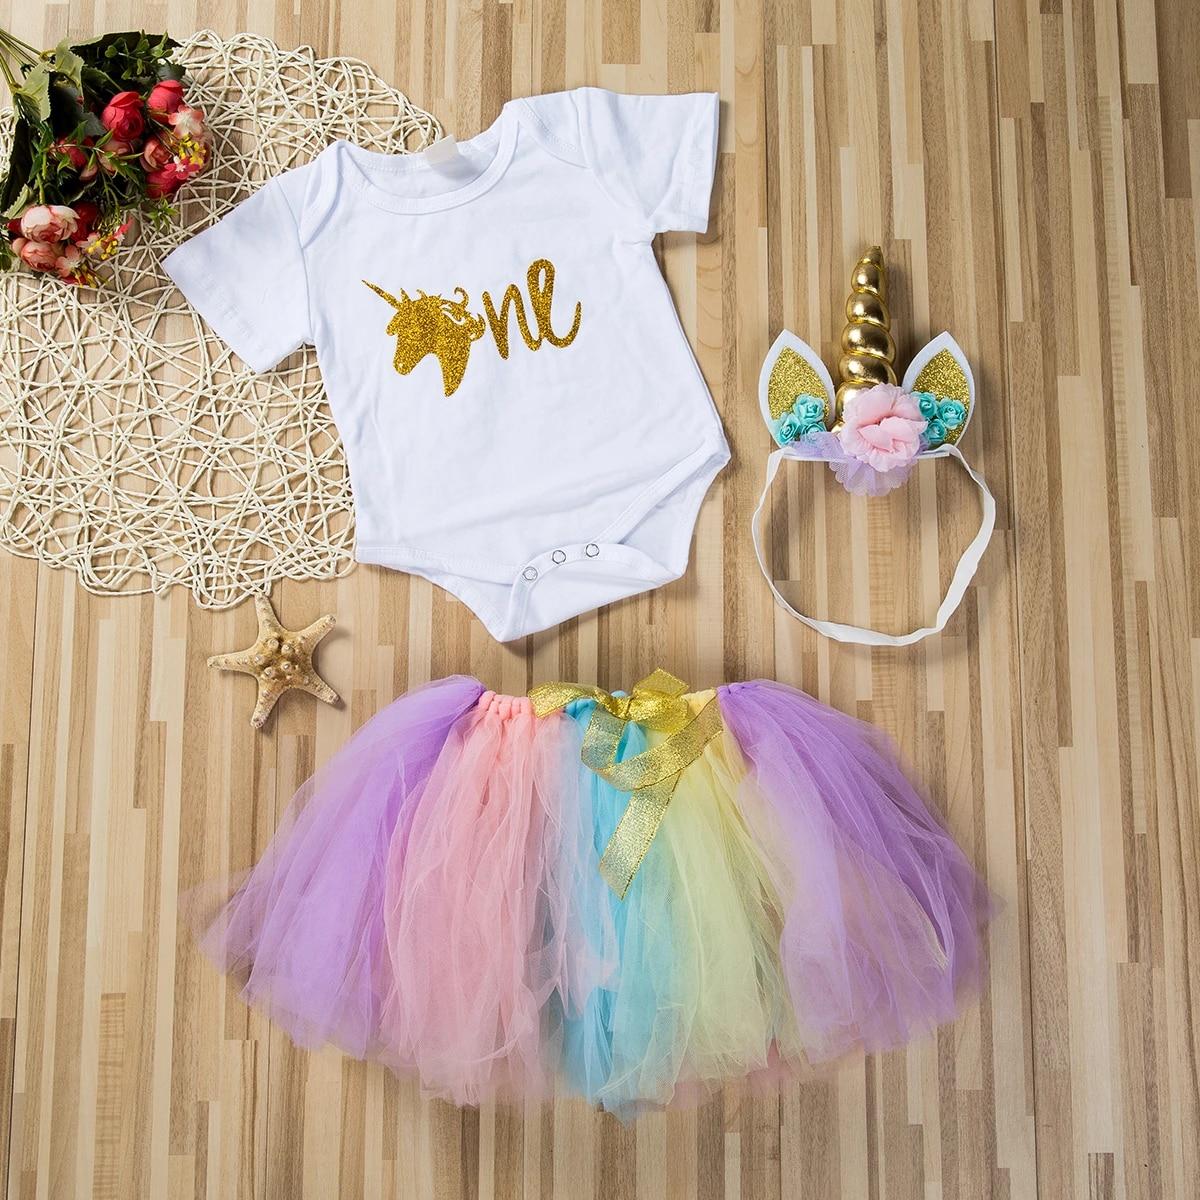 Details about  /Baby Girl dresses 0-3-6-9-12-18months Dress Princess Party bodysuits vest